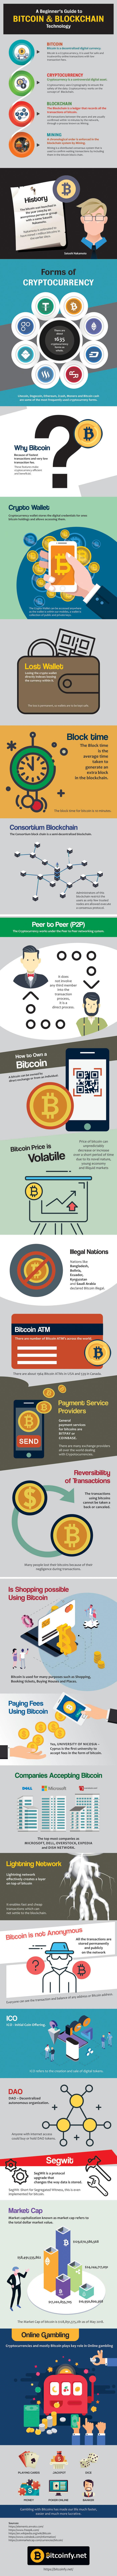 Bitcoin-Infographic_final.jpg